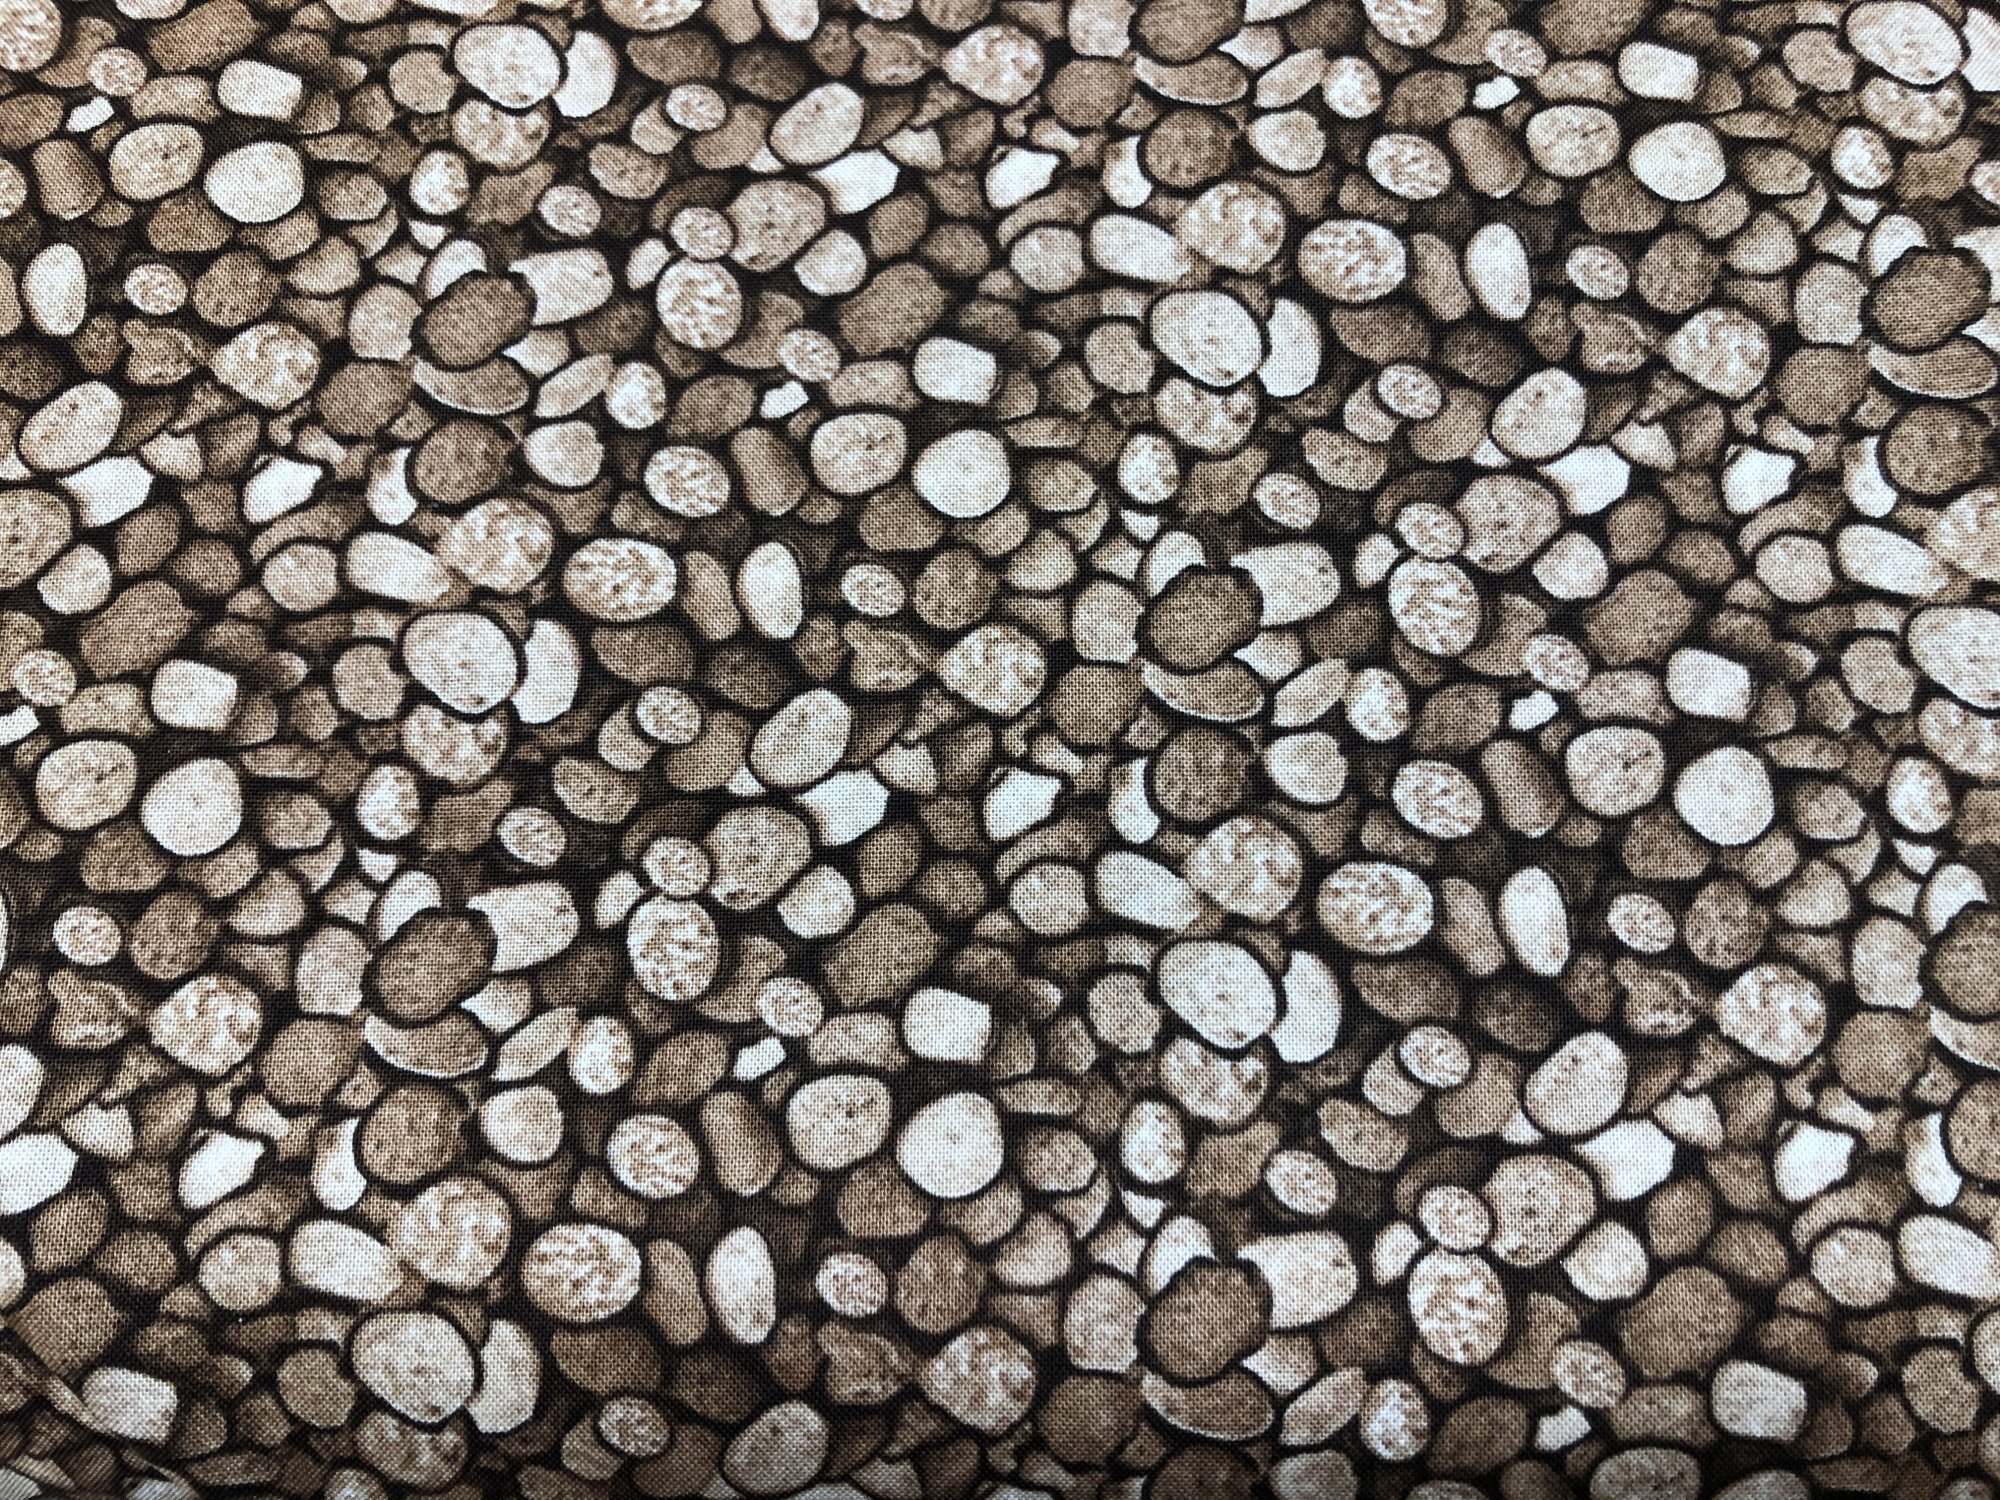 Natural Treasures Brown Stones A7369 030